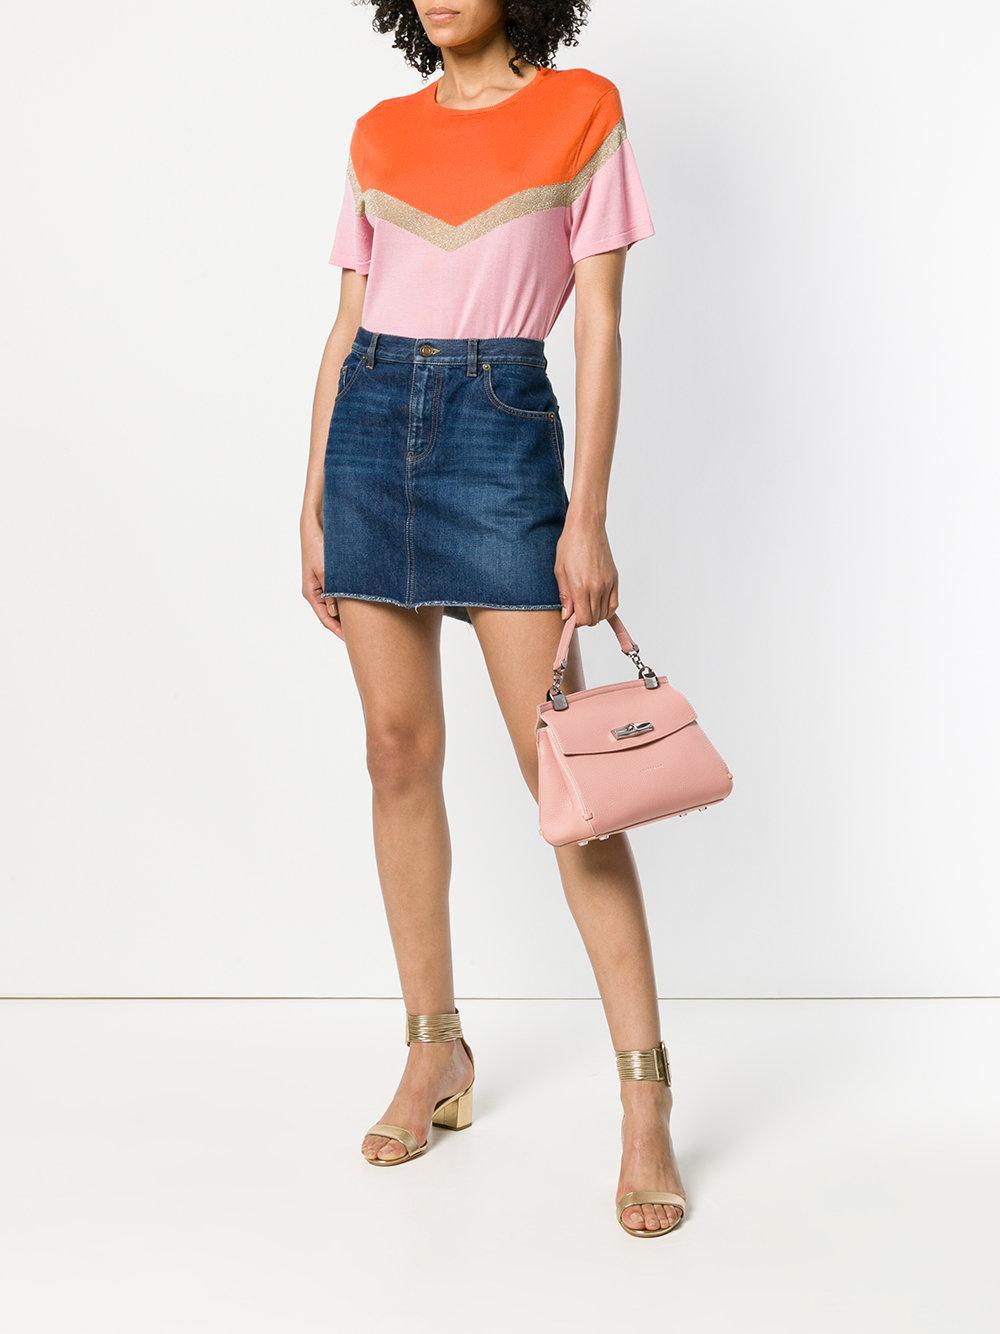 Longchamp Leather Madelein Flip Lock Tote Bag in Pink & Purple (Pink)